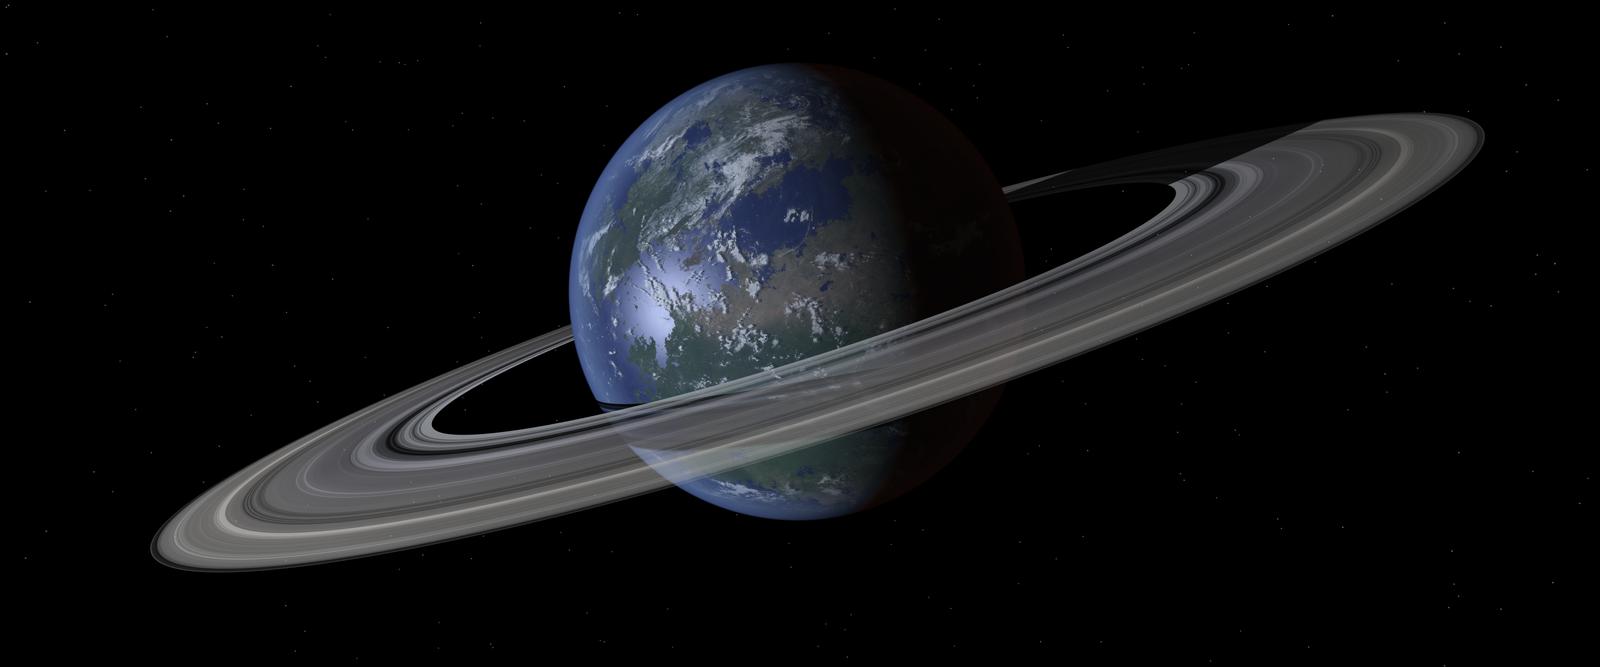 hd neptune planet rings - photo #25